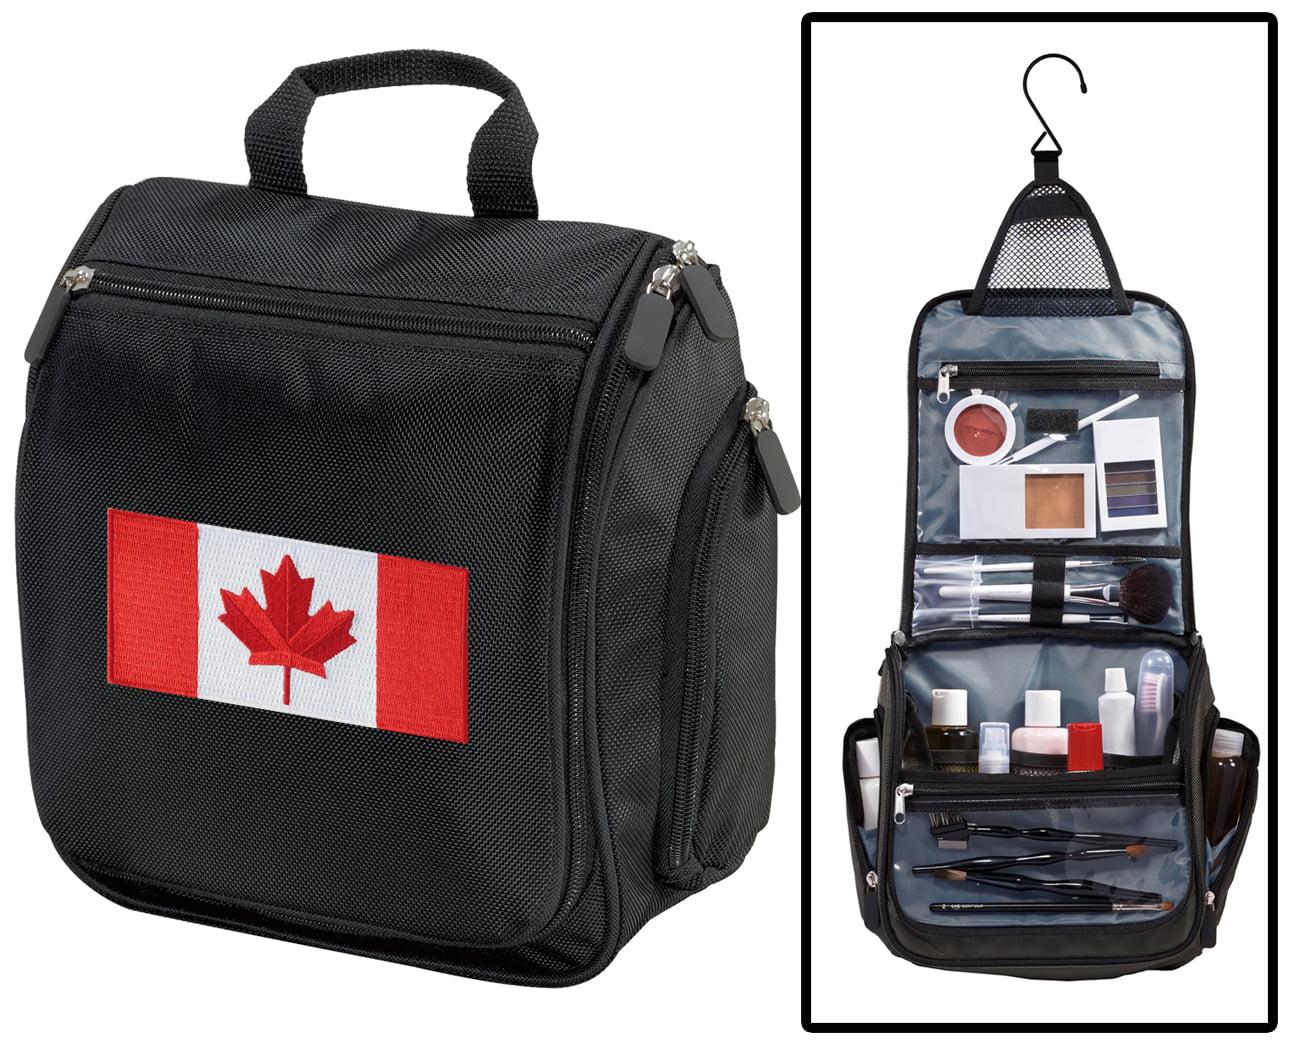 Canadian Flag Toiletry Bag or Canada Flag Shaving Kit